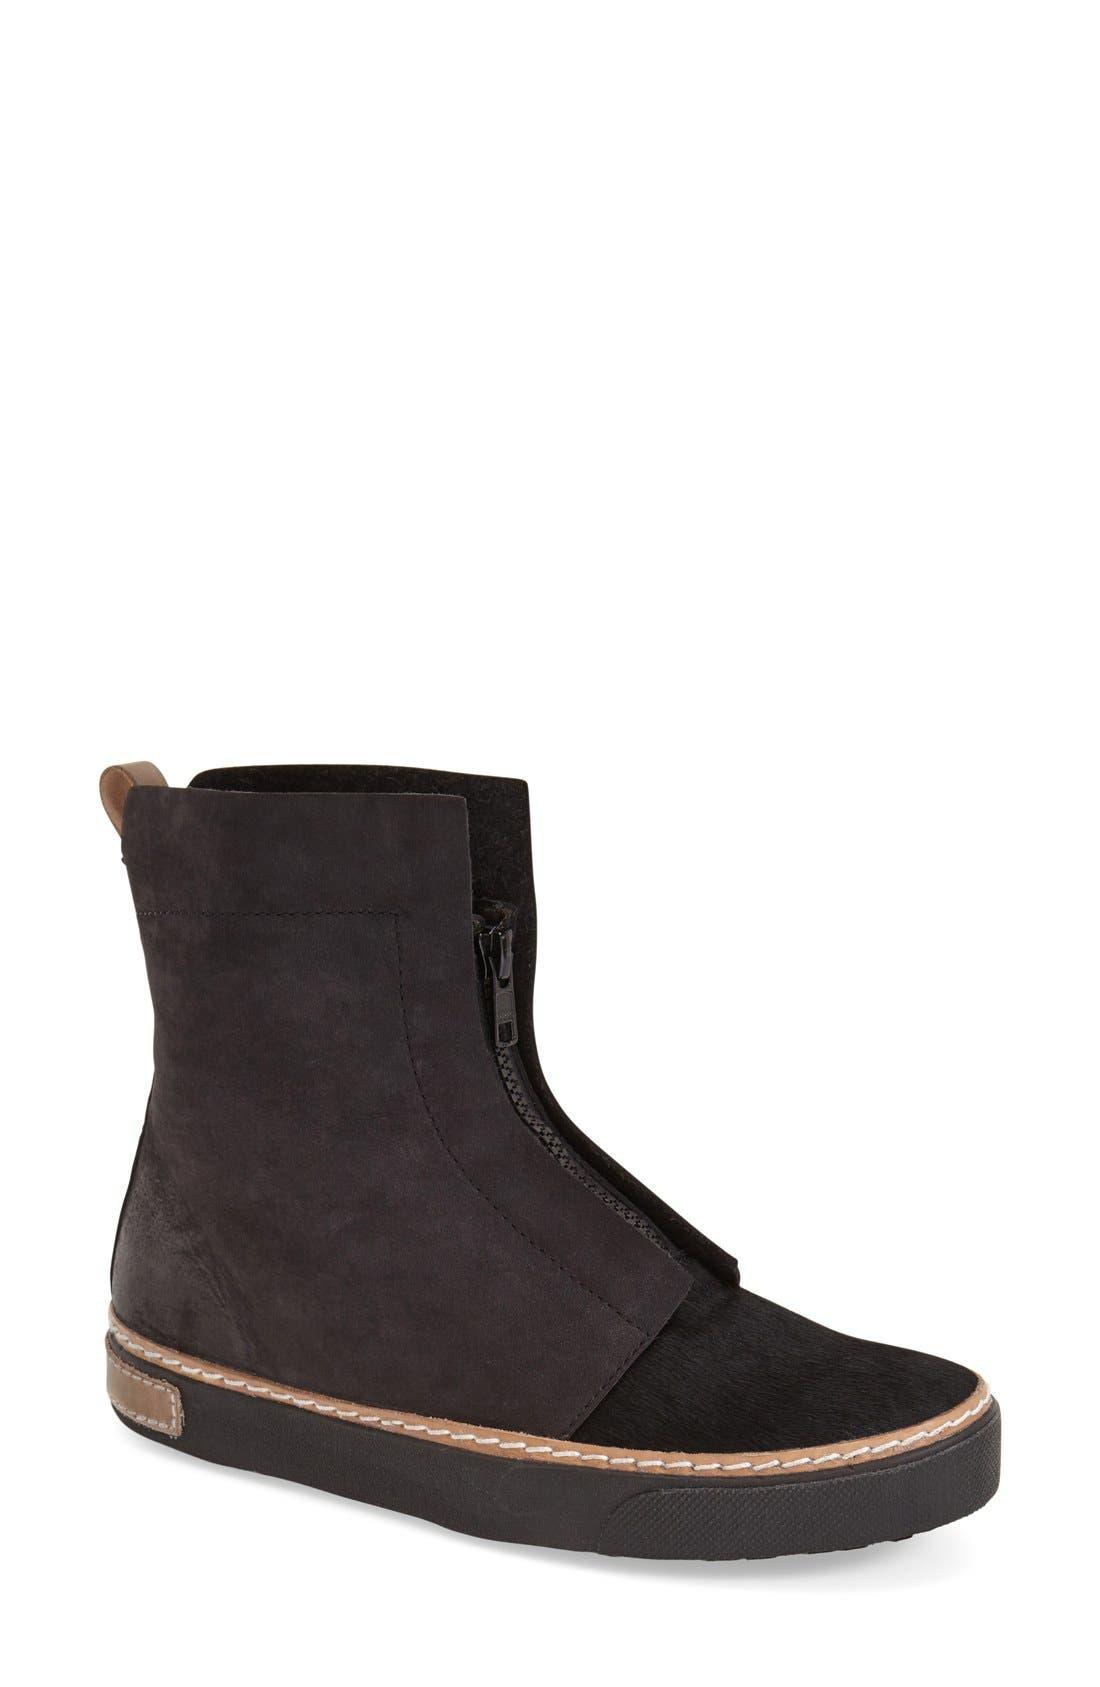 Genuine Calf Hair Zip Chukka Boot,                         Main,                         color, Black Leather